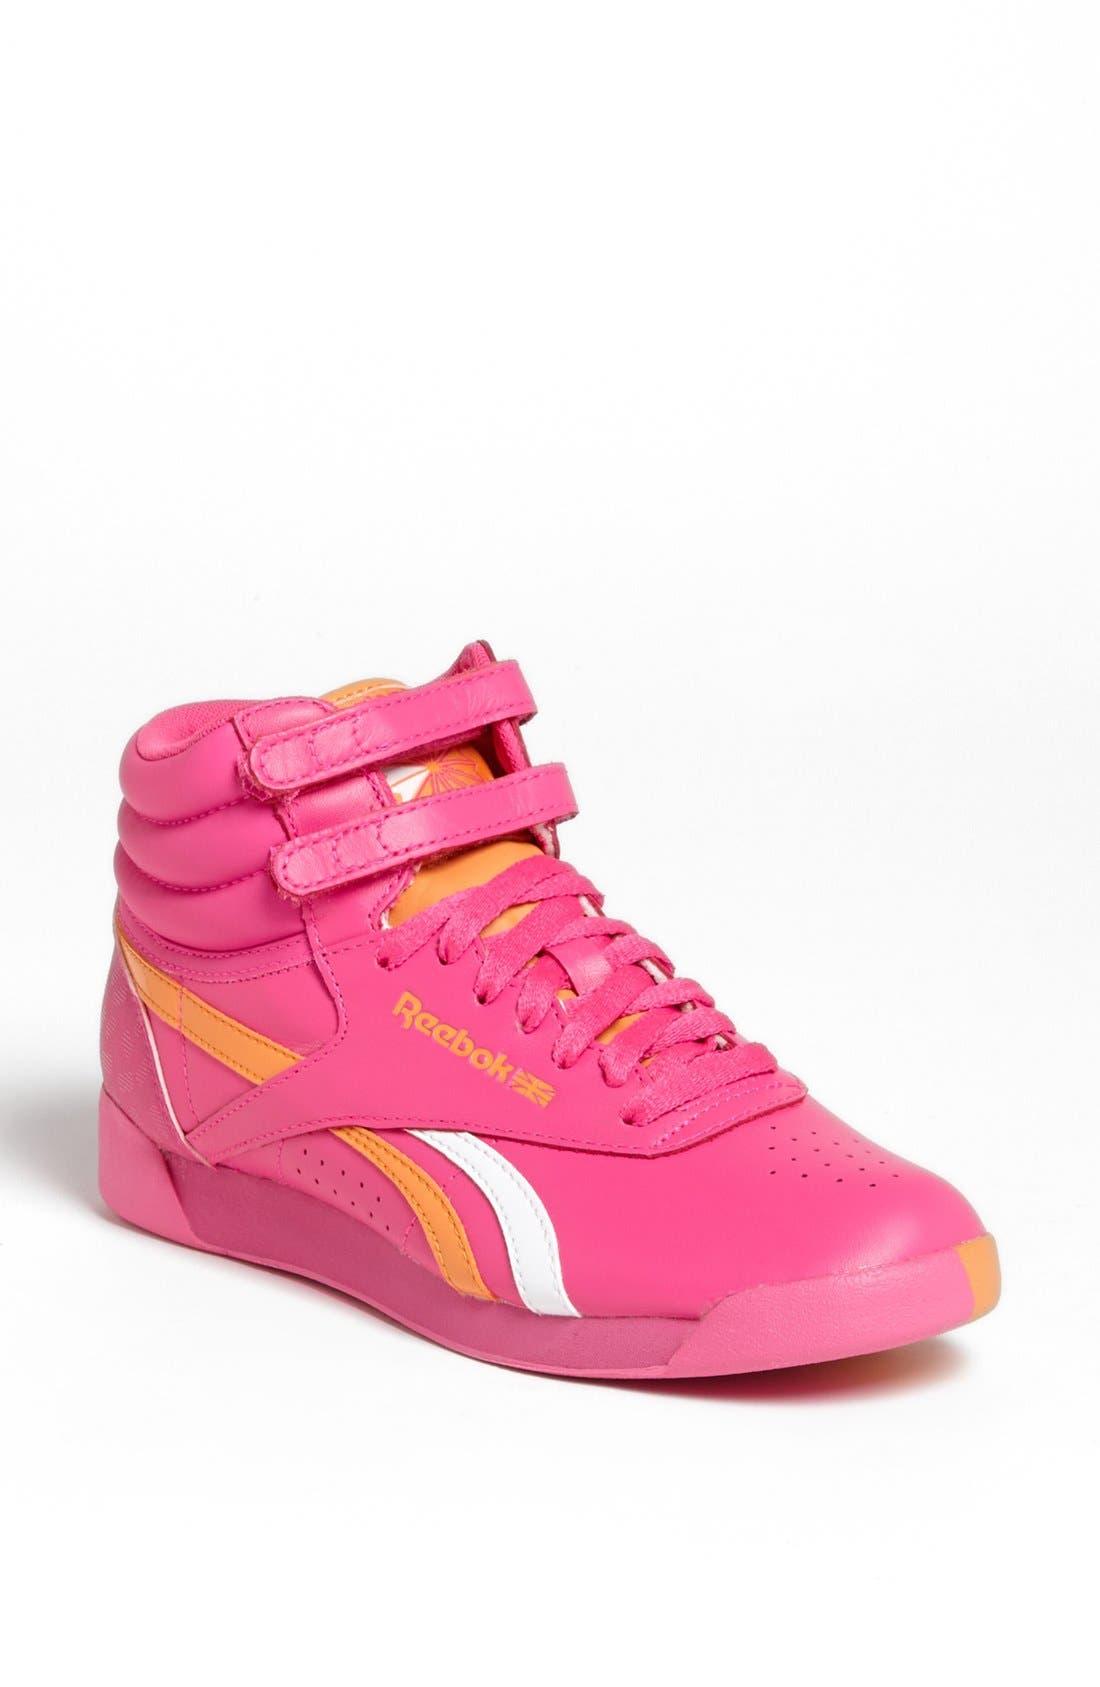 Main Image - Reebok 'F/S Hi Splitz' High Top Sneaker (Women)